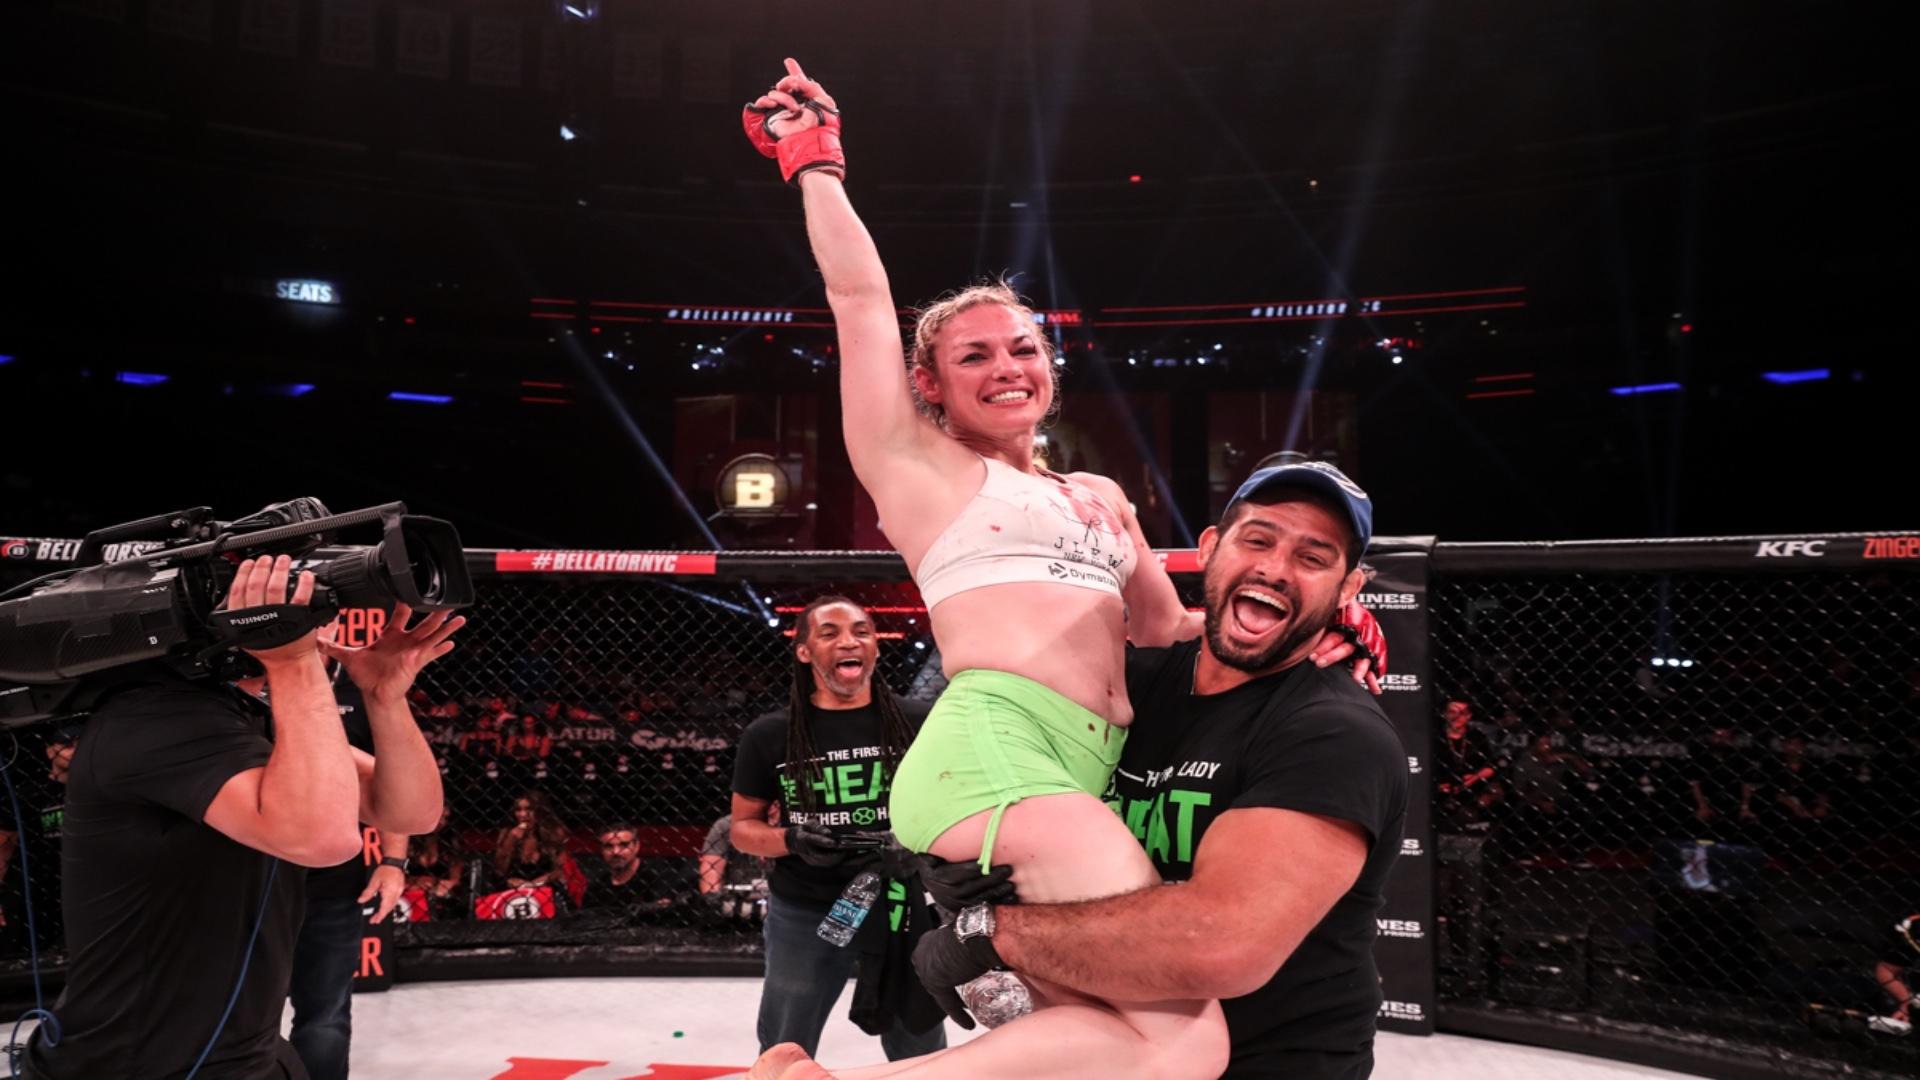 WBO female featherweight titlist Heather Hardy after a match in Bellator MMA